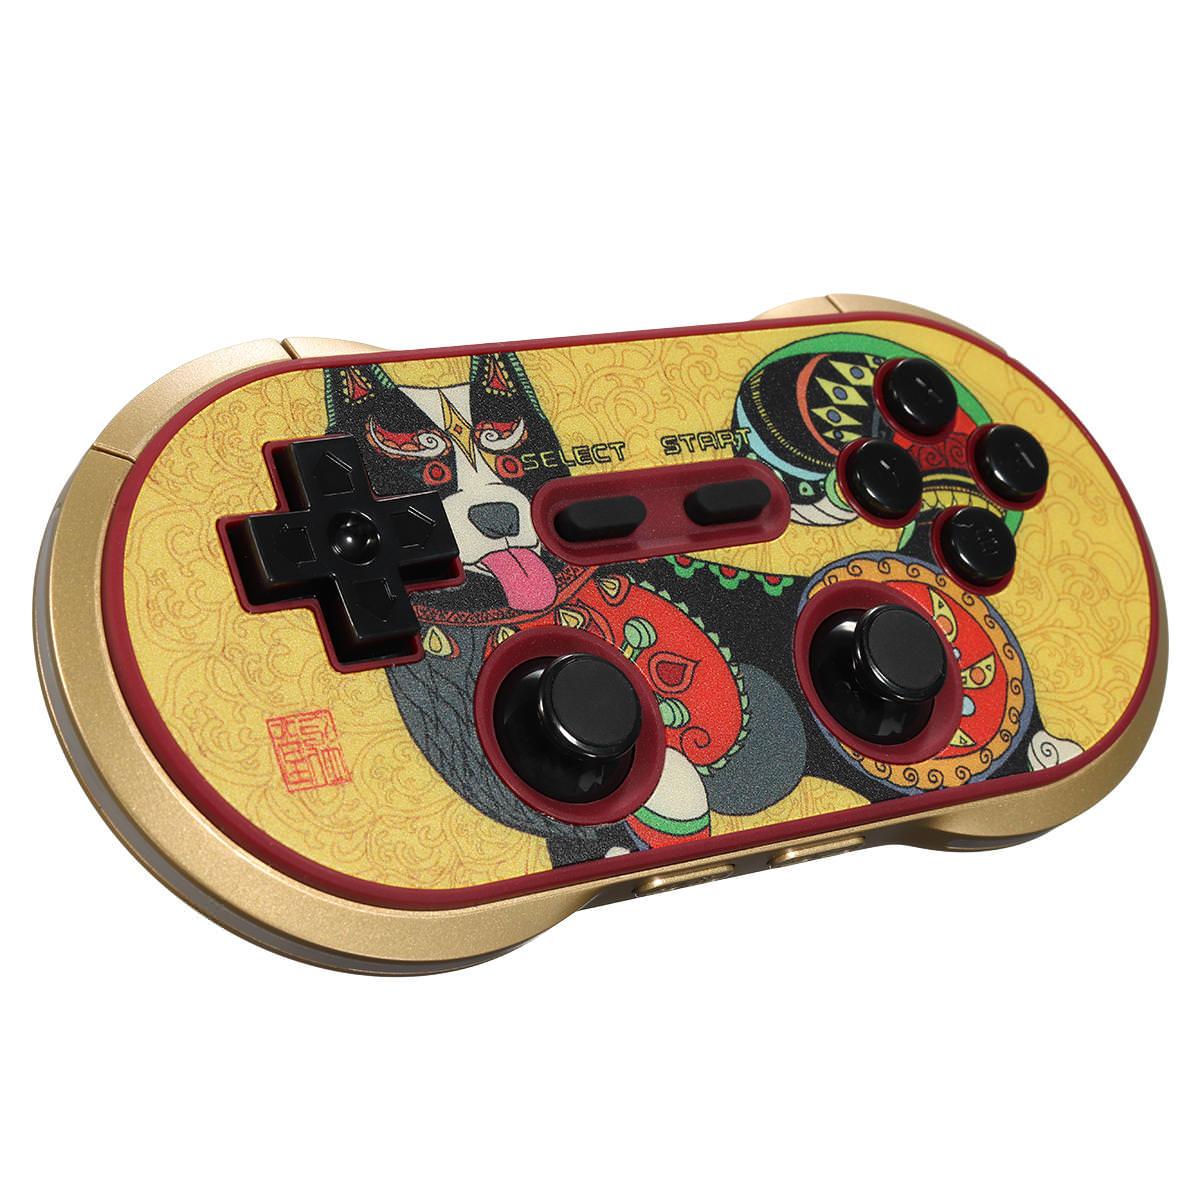 buy 8bitdo fc30 pro wireless game controller